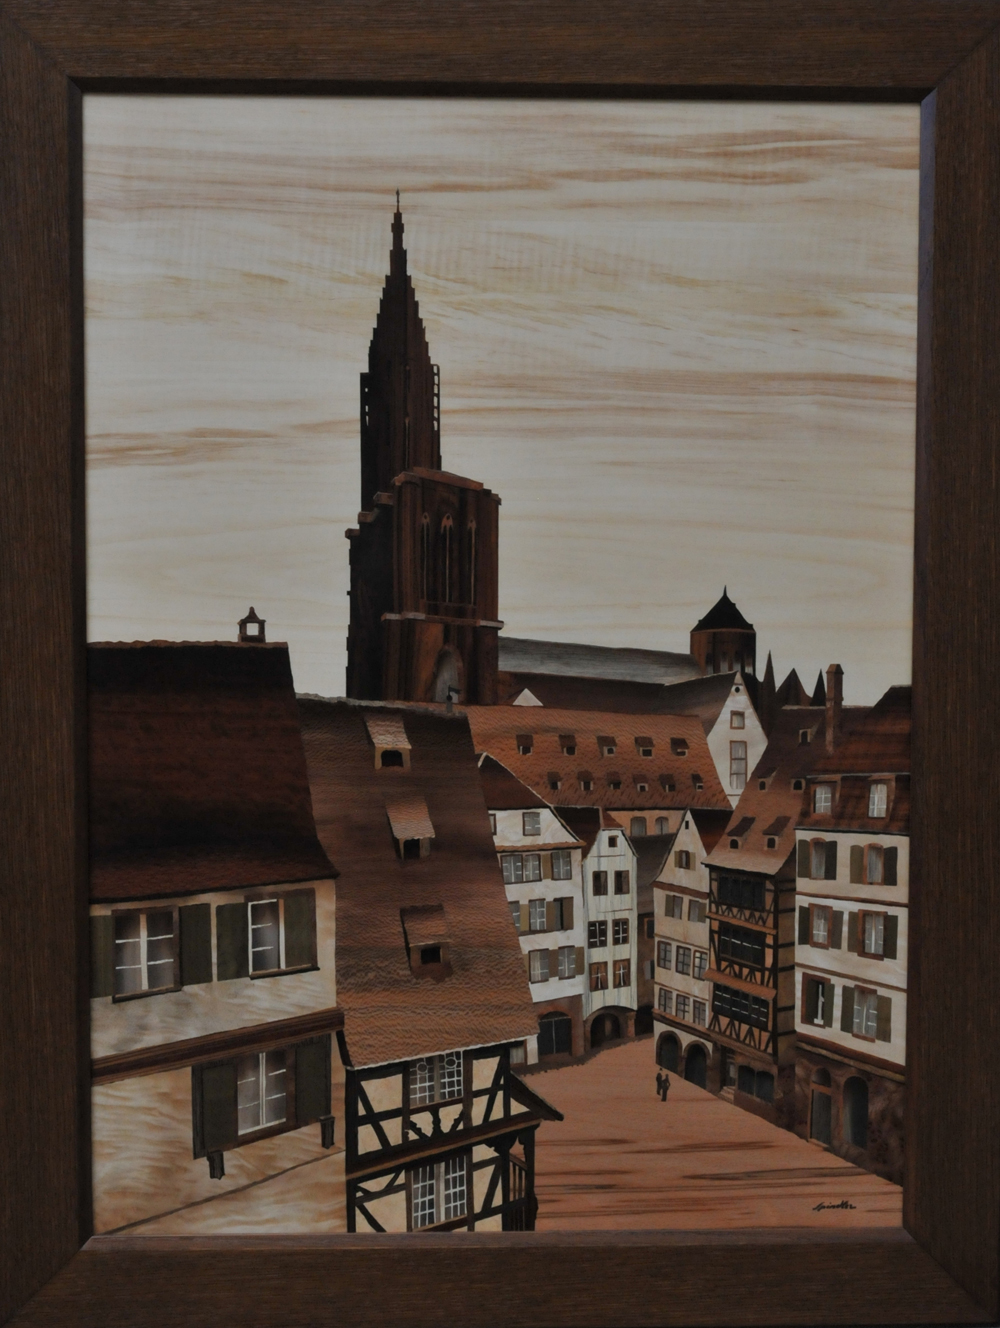 Strasbourg cath drale marqueterie d 39 art spindler - Residence les jardins d alsace strasbourg ...